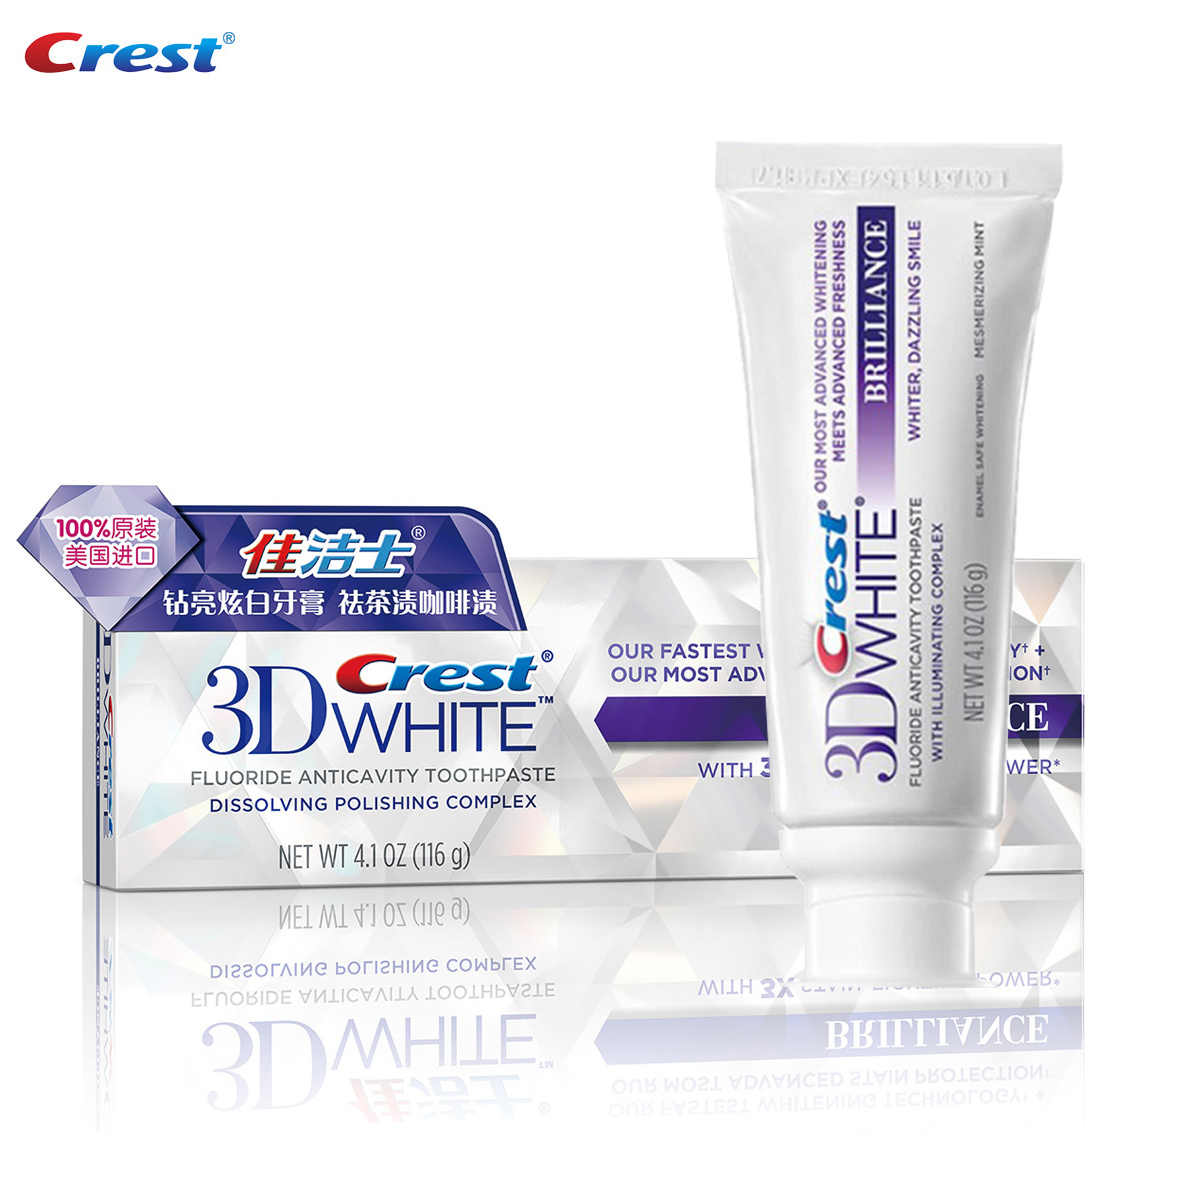 3d White Teeth Whitening Toothpaste Crest Brilliance Advanced